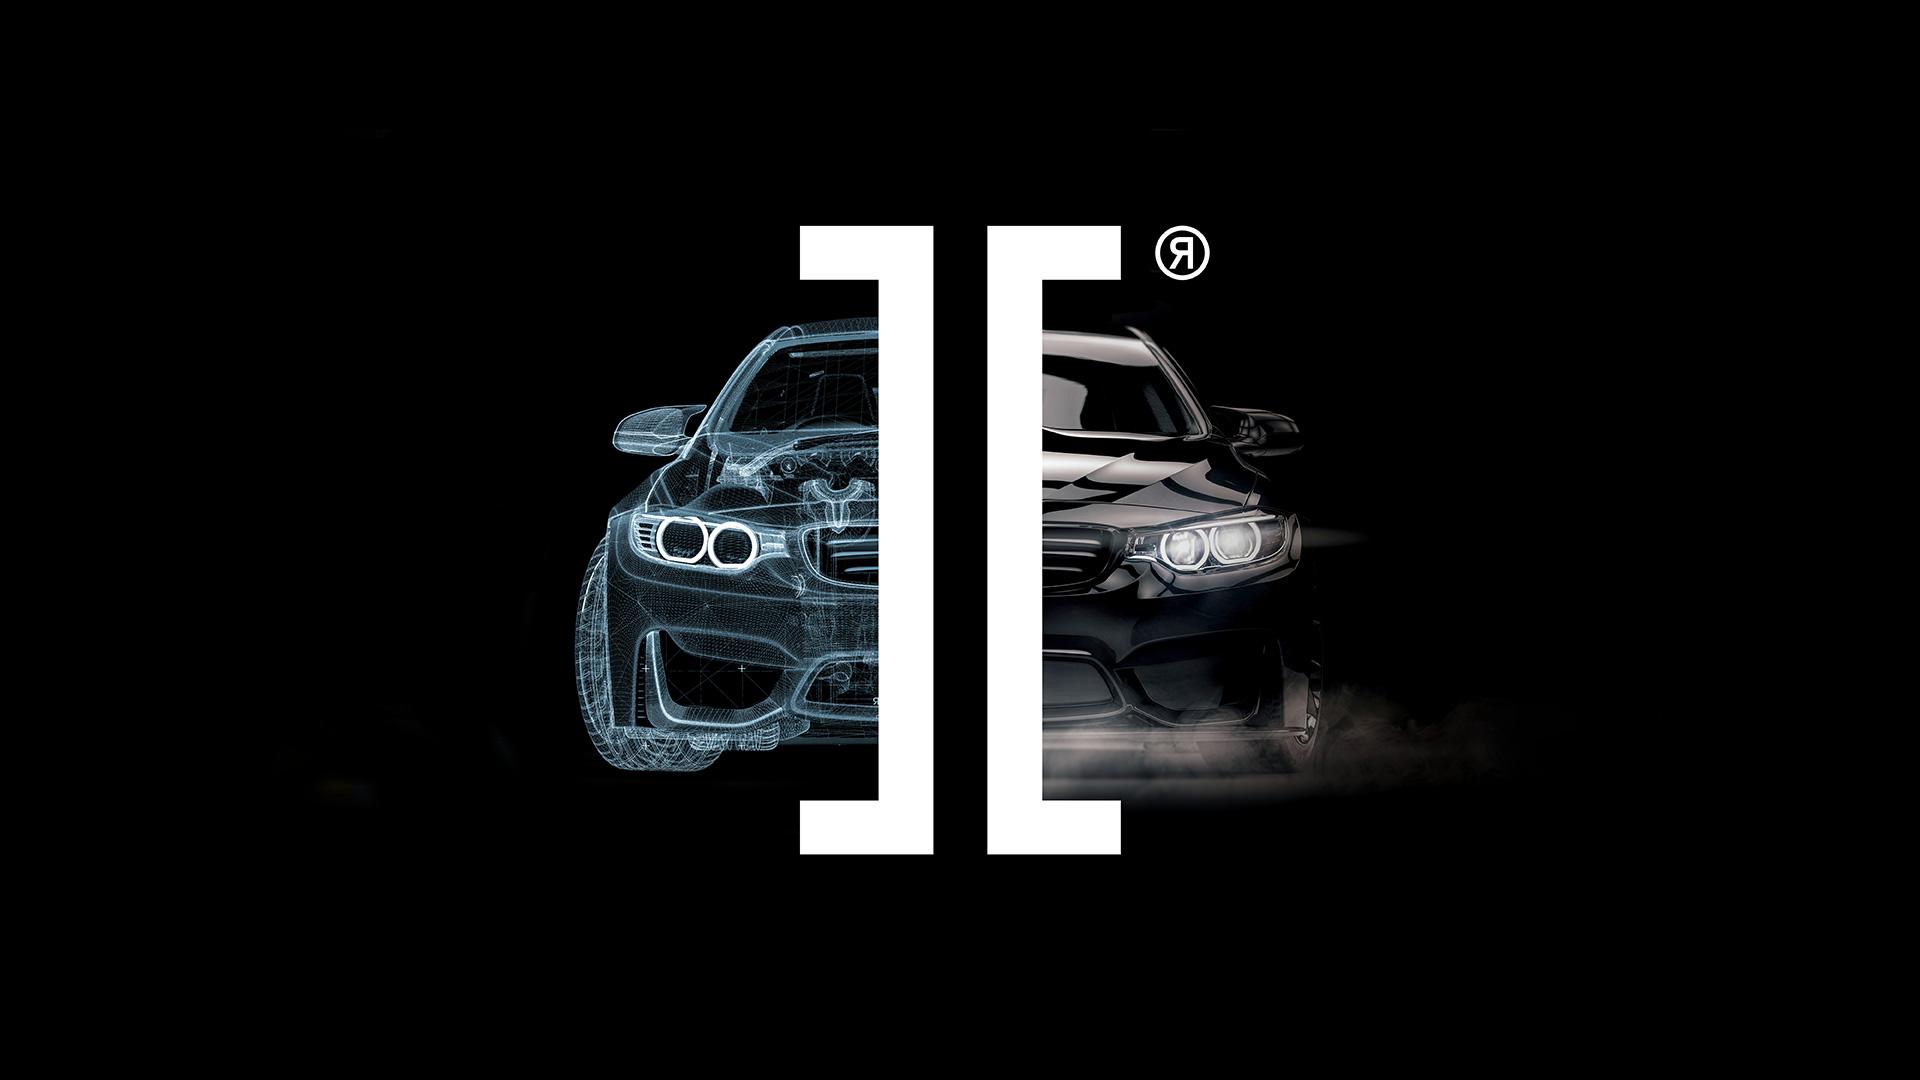 Irregular_Corporation_brand_identity3